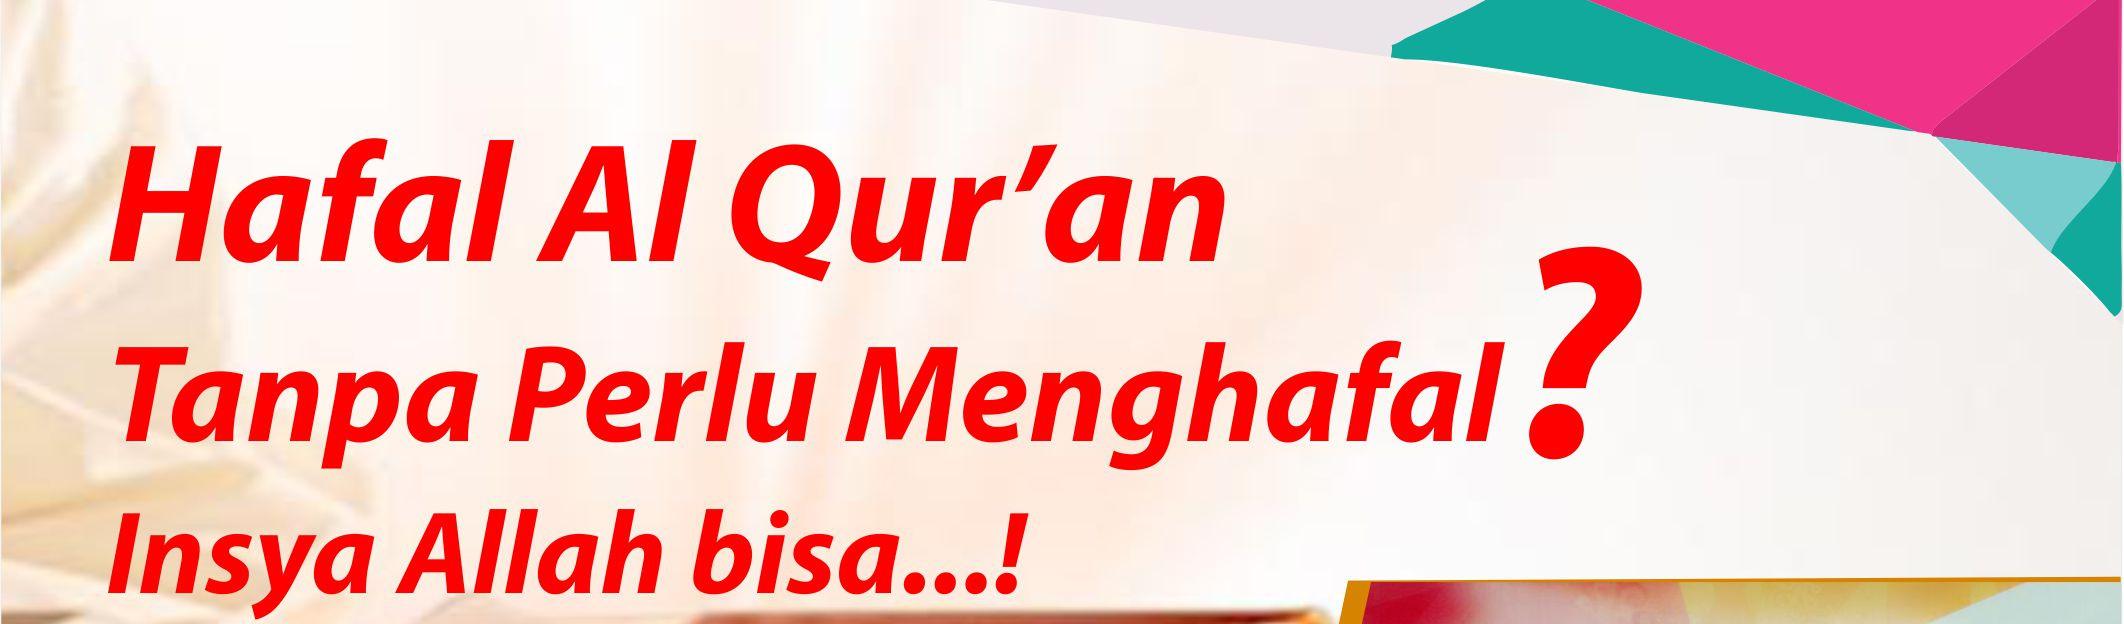 hafal-tanpa-menghafal-tagline-tikrar-pondok-islami